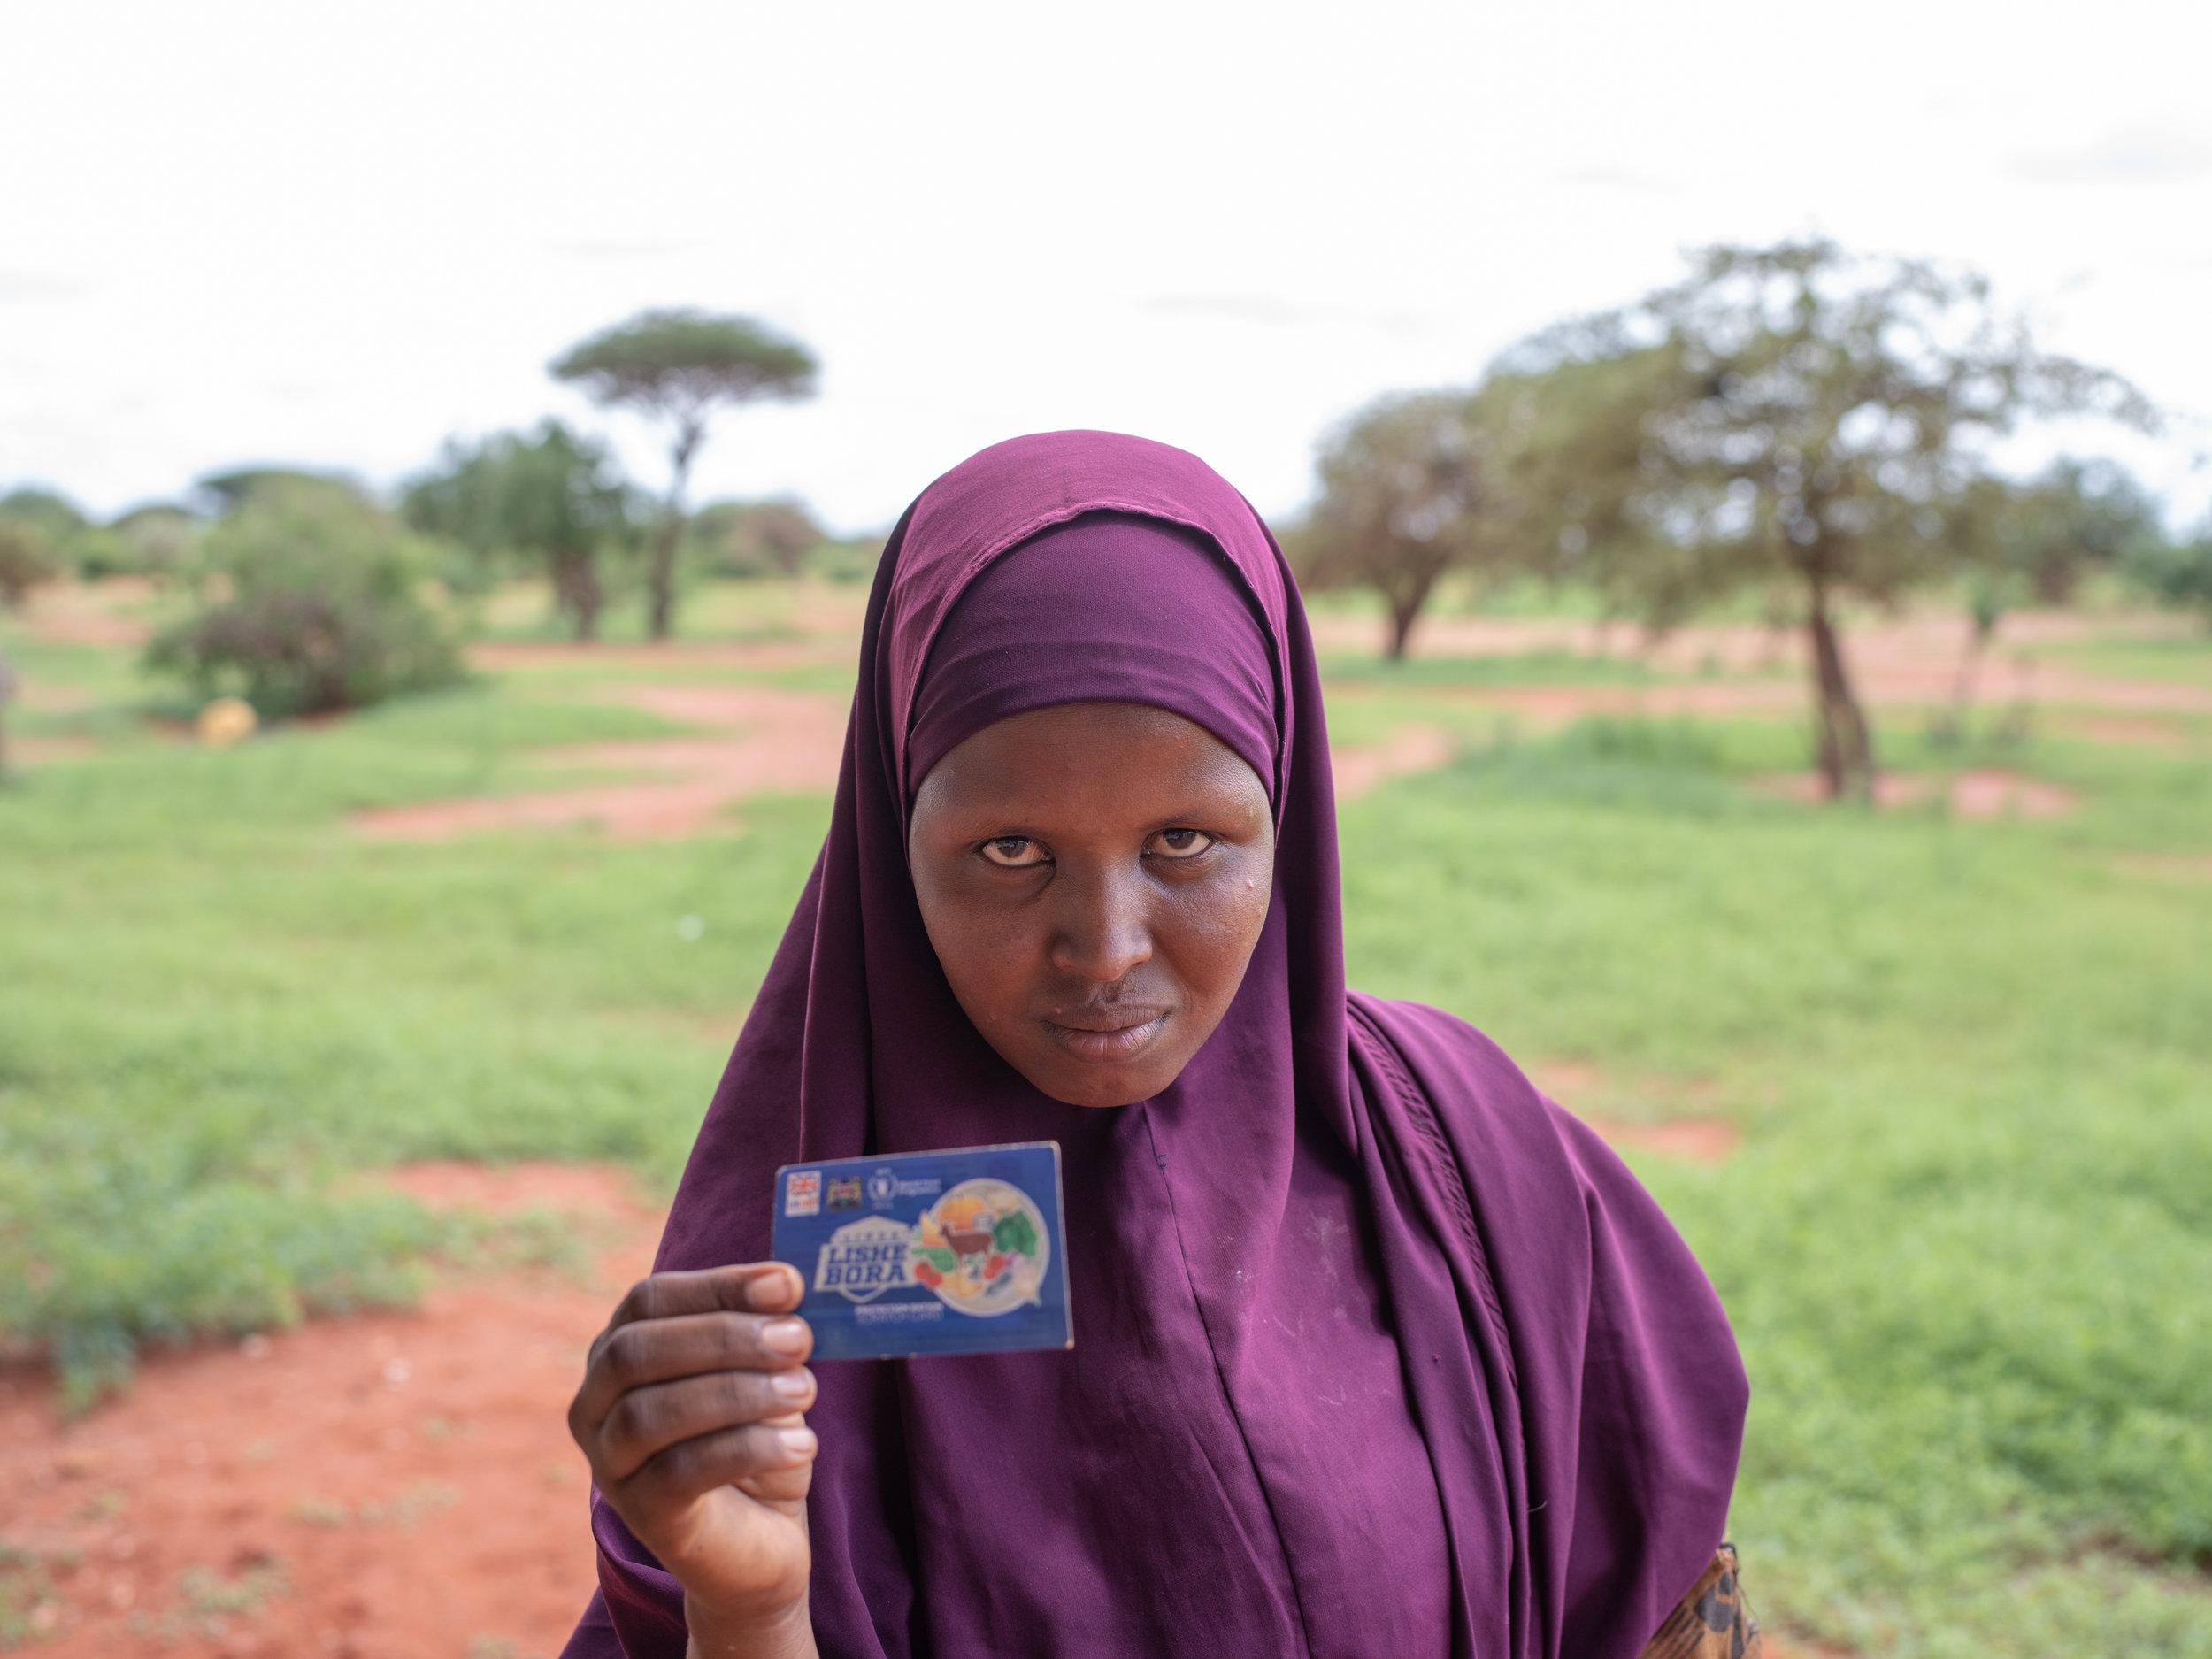 Information gaps drive mistrust in cash transfer programs